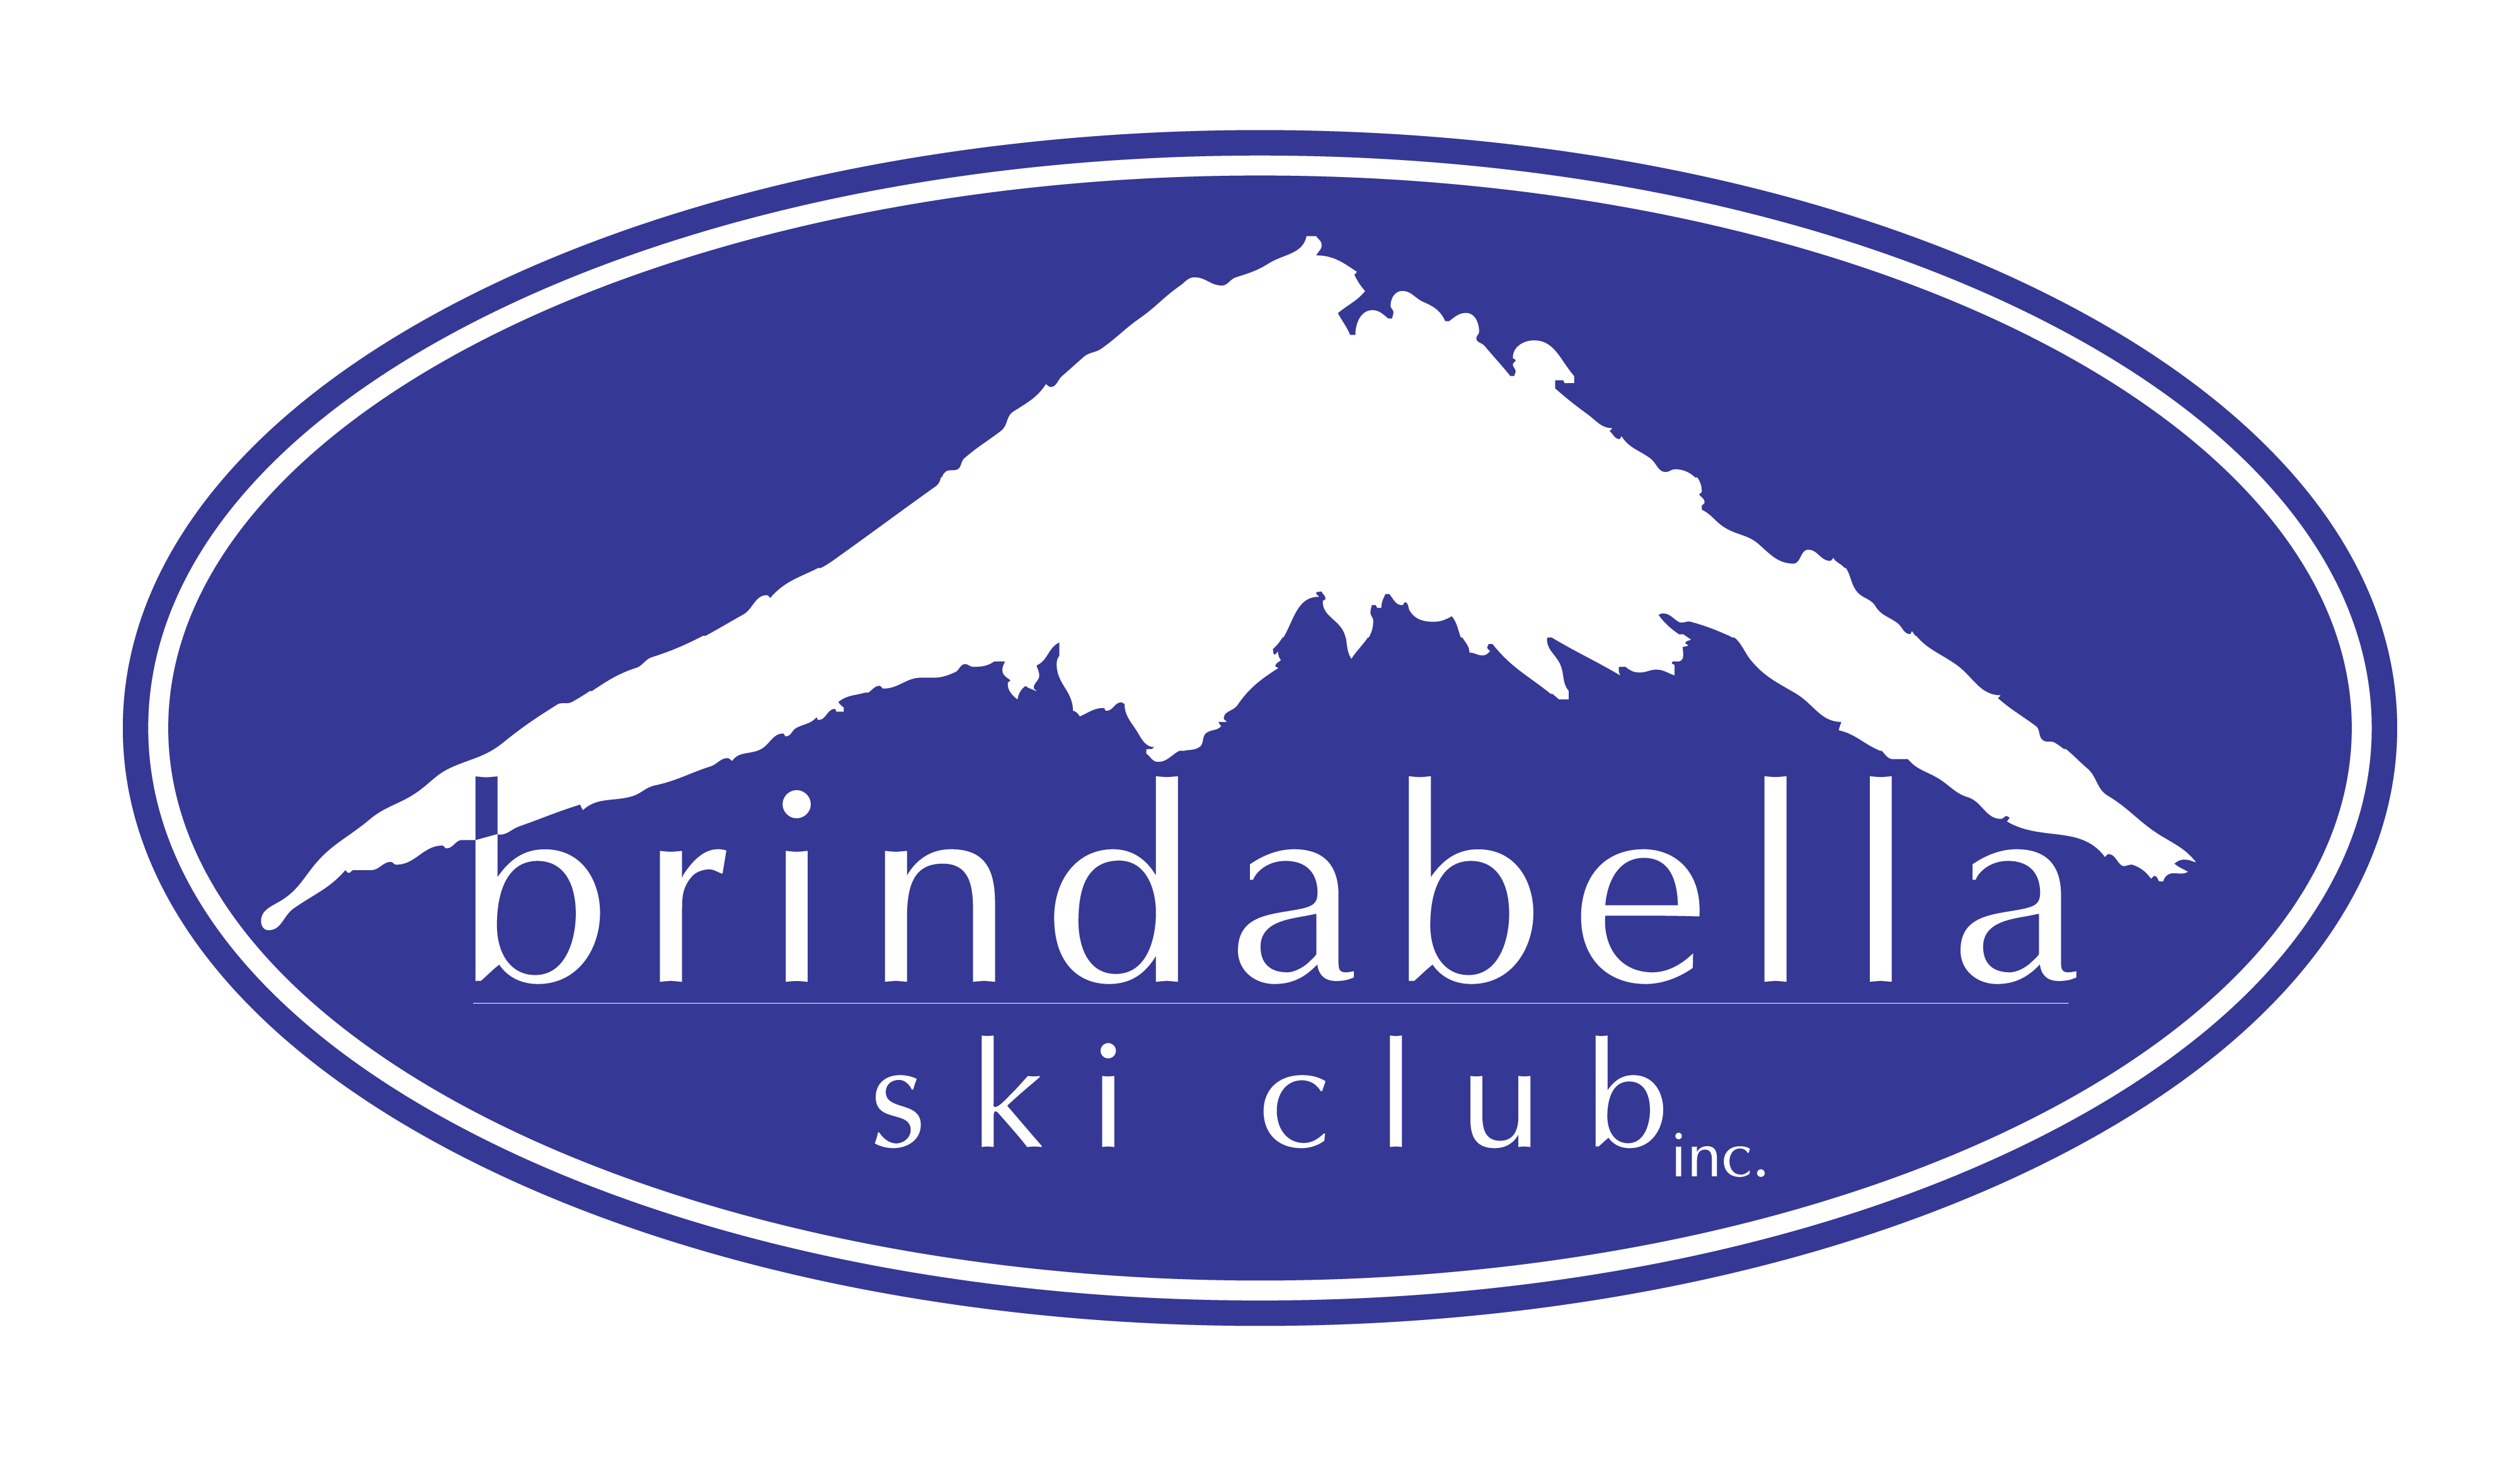 Brindabella Ski Club